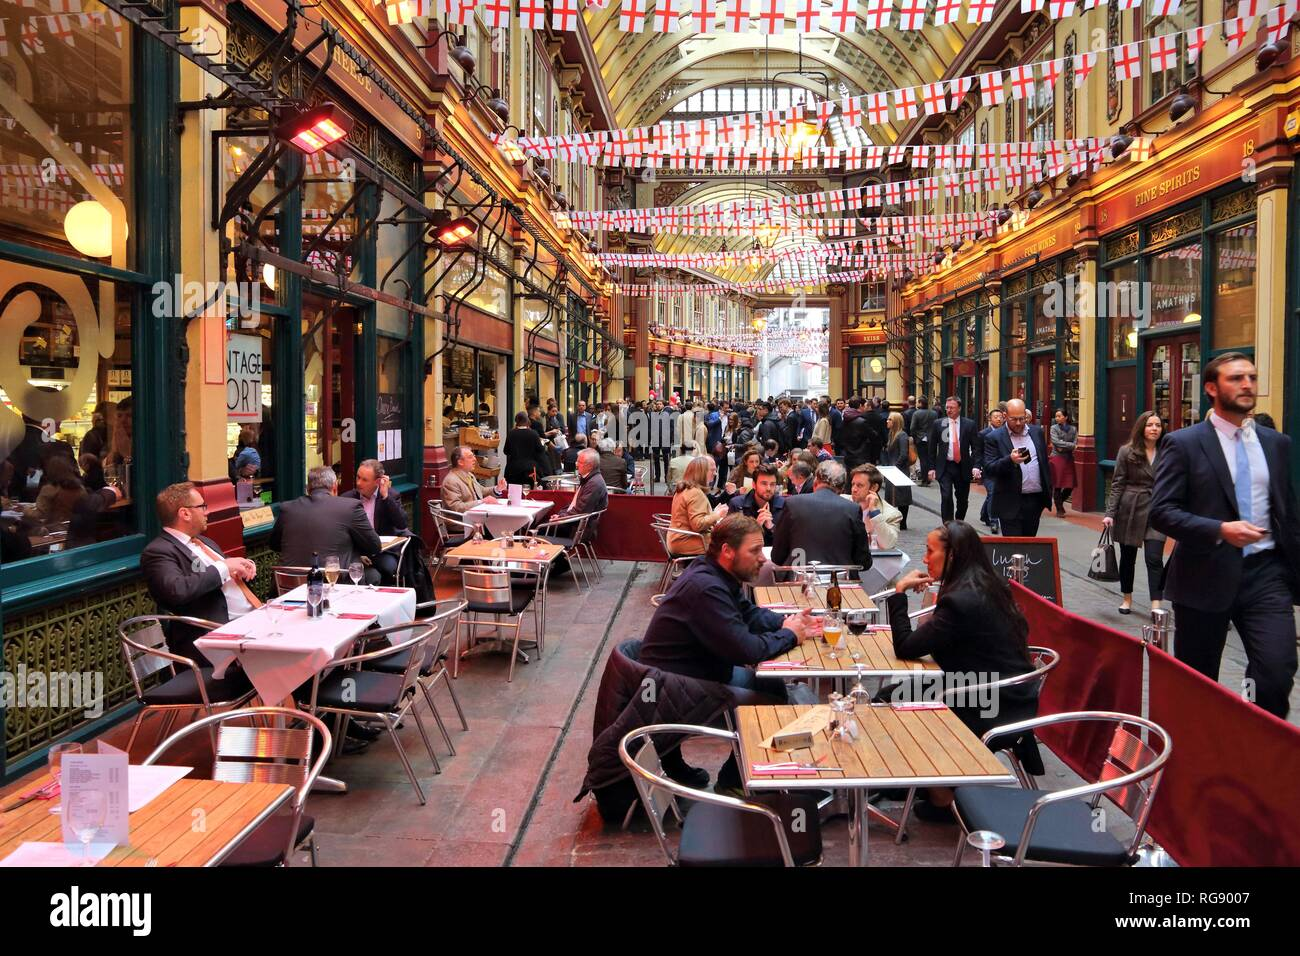 LONDON, UK - APRIL 22, 2016: People celebrate Saint George's Day in Leadenhall Market, London. Saint George is the patron saint of England. Stock Photo